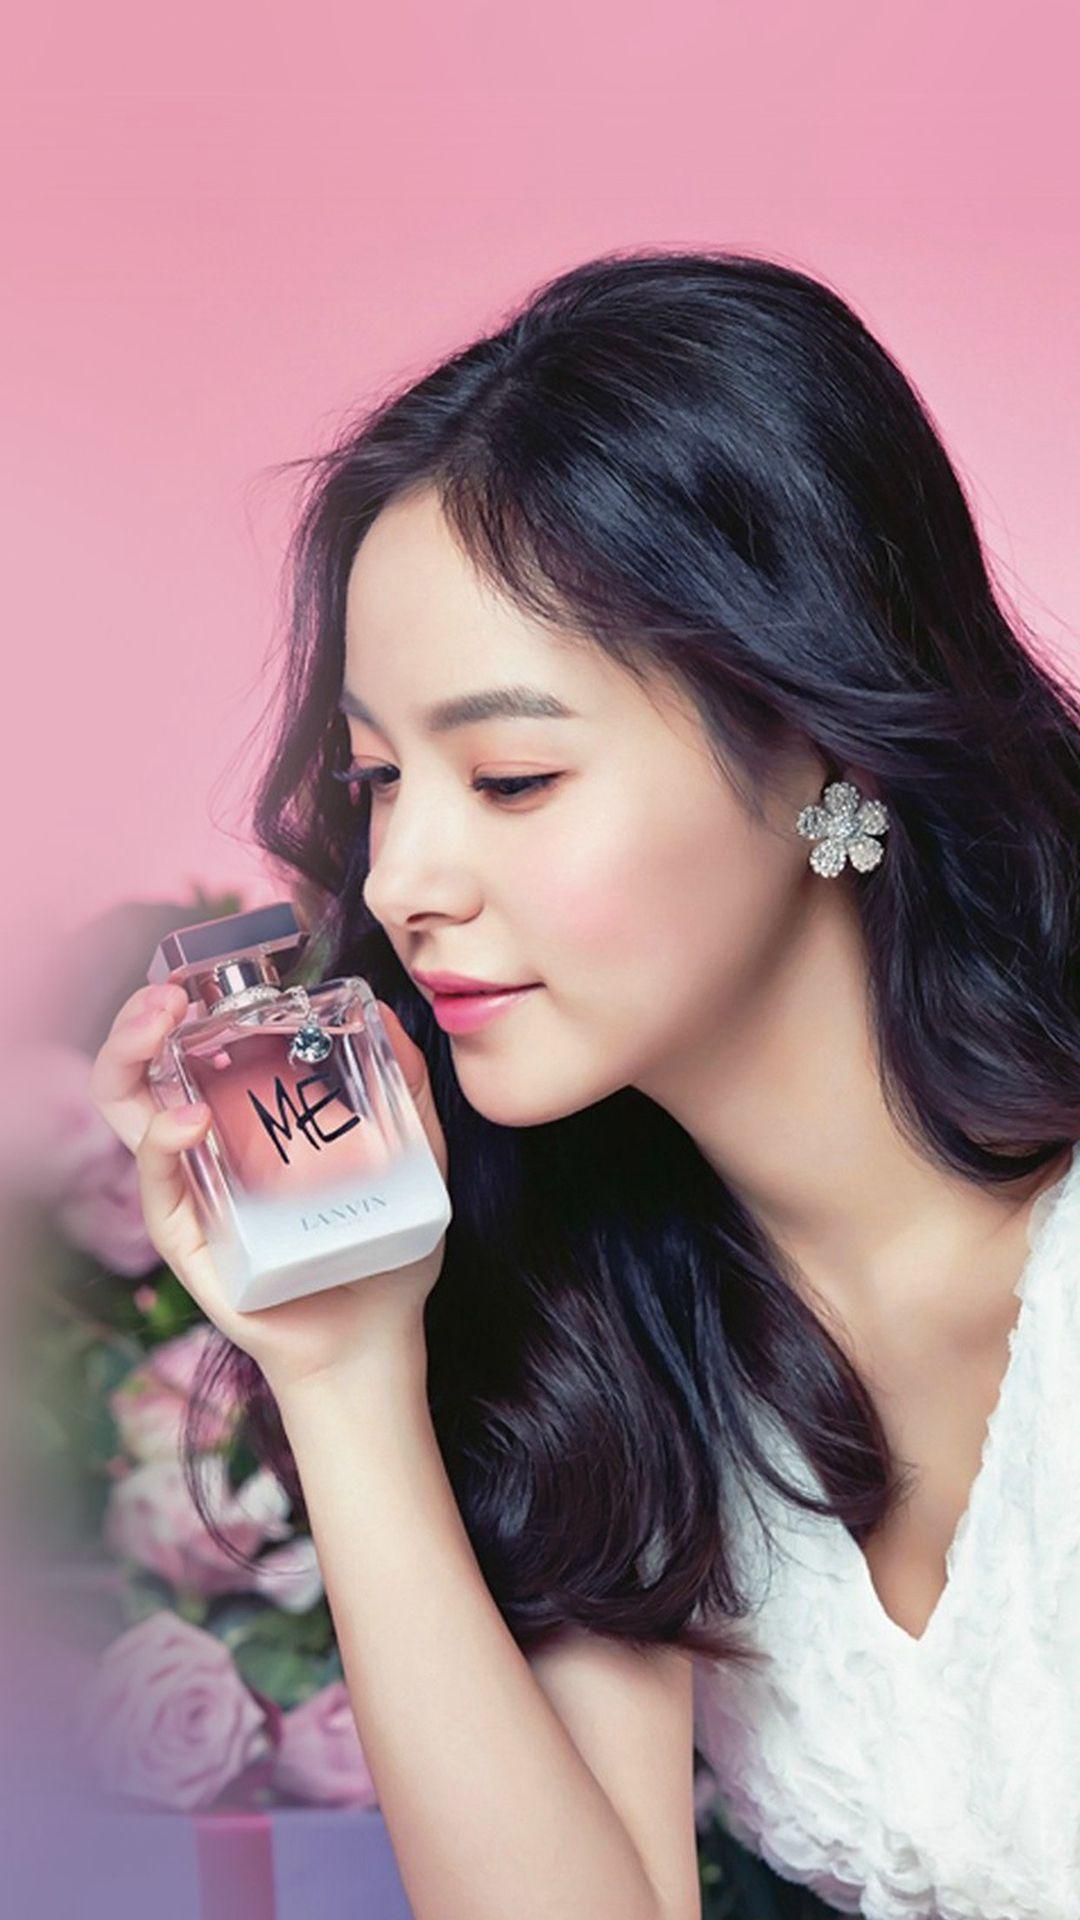 Min Hyorin Pink Ad Cute Kpop iPhone 8 Wallpapers Iphone